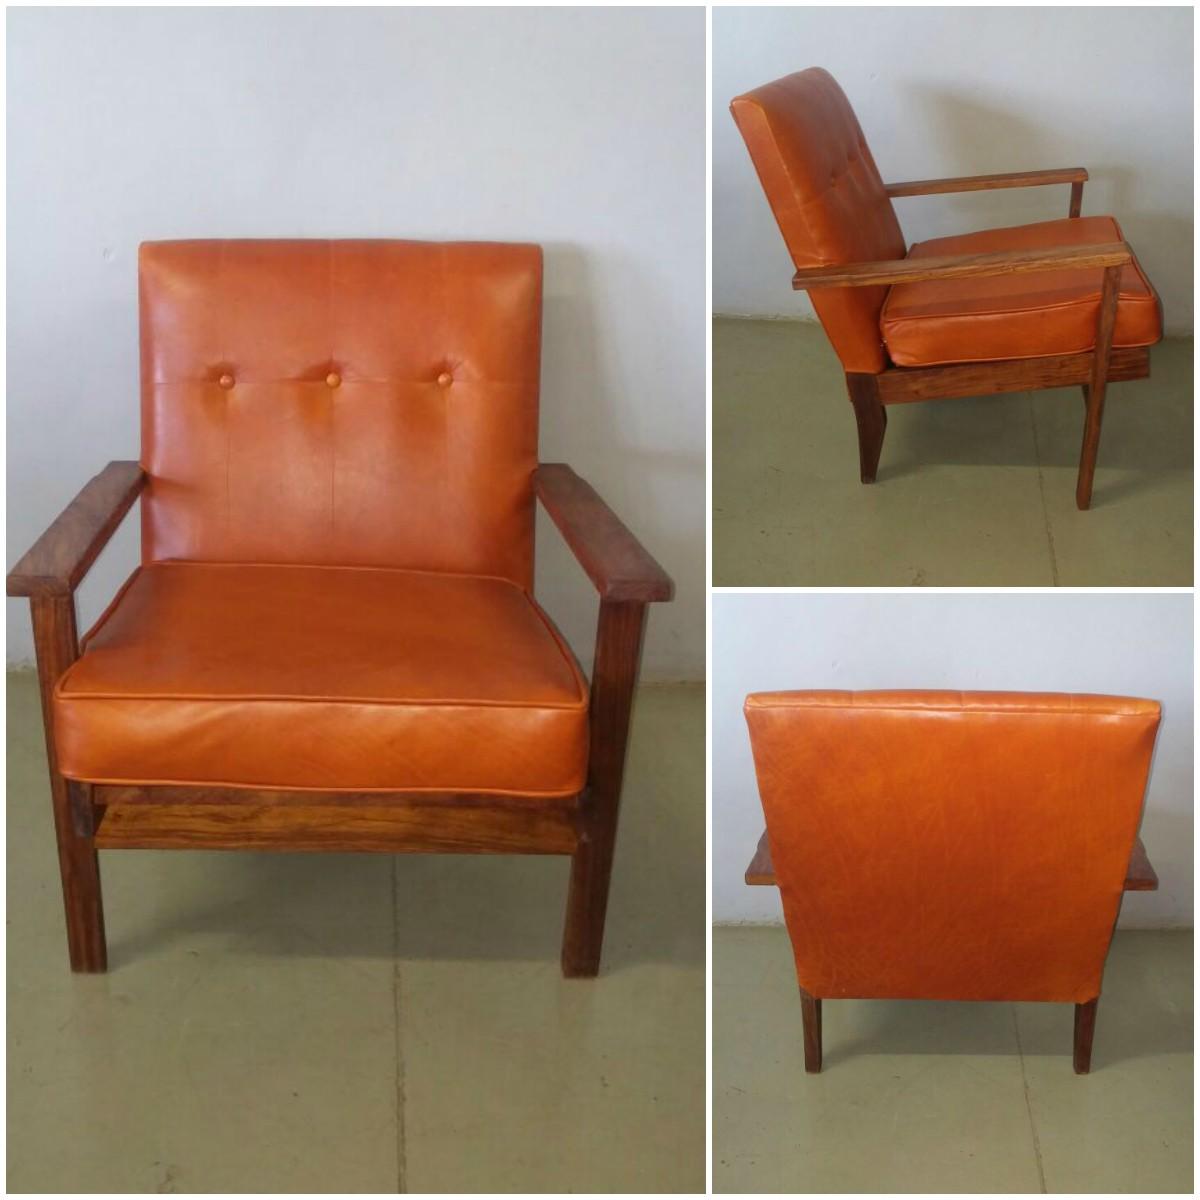 Brown leather chair.jpg